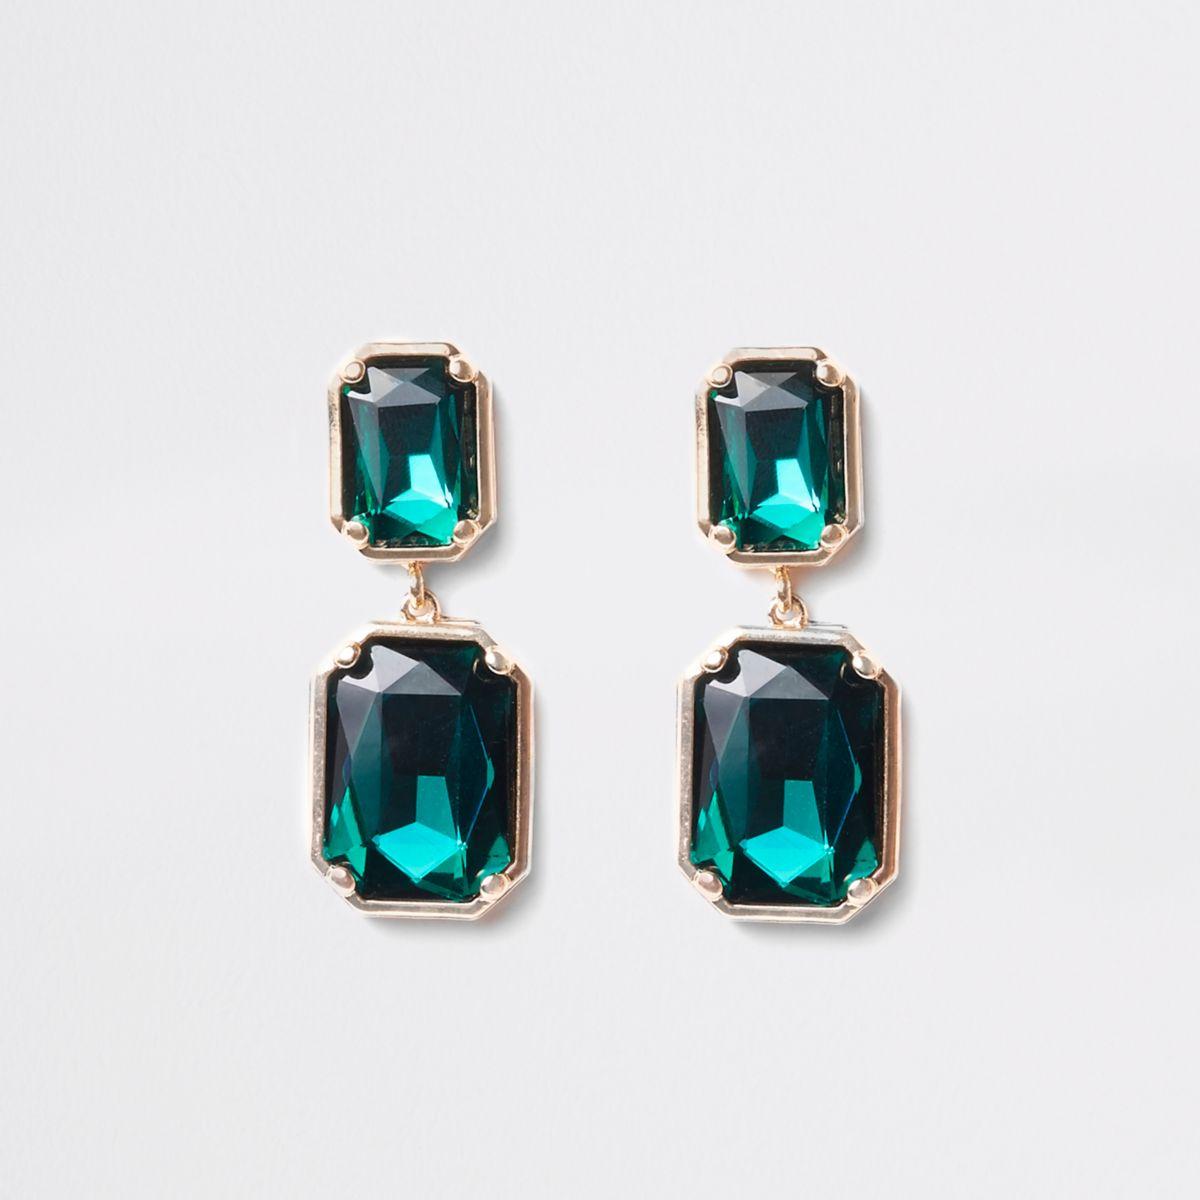 Green emerald rectangle stud earrings